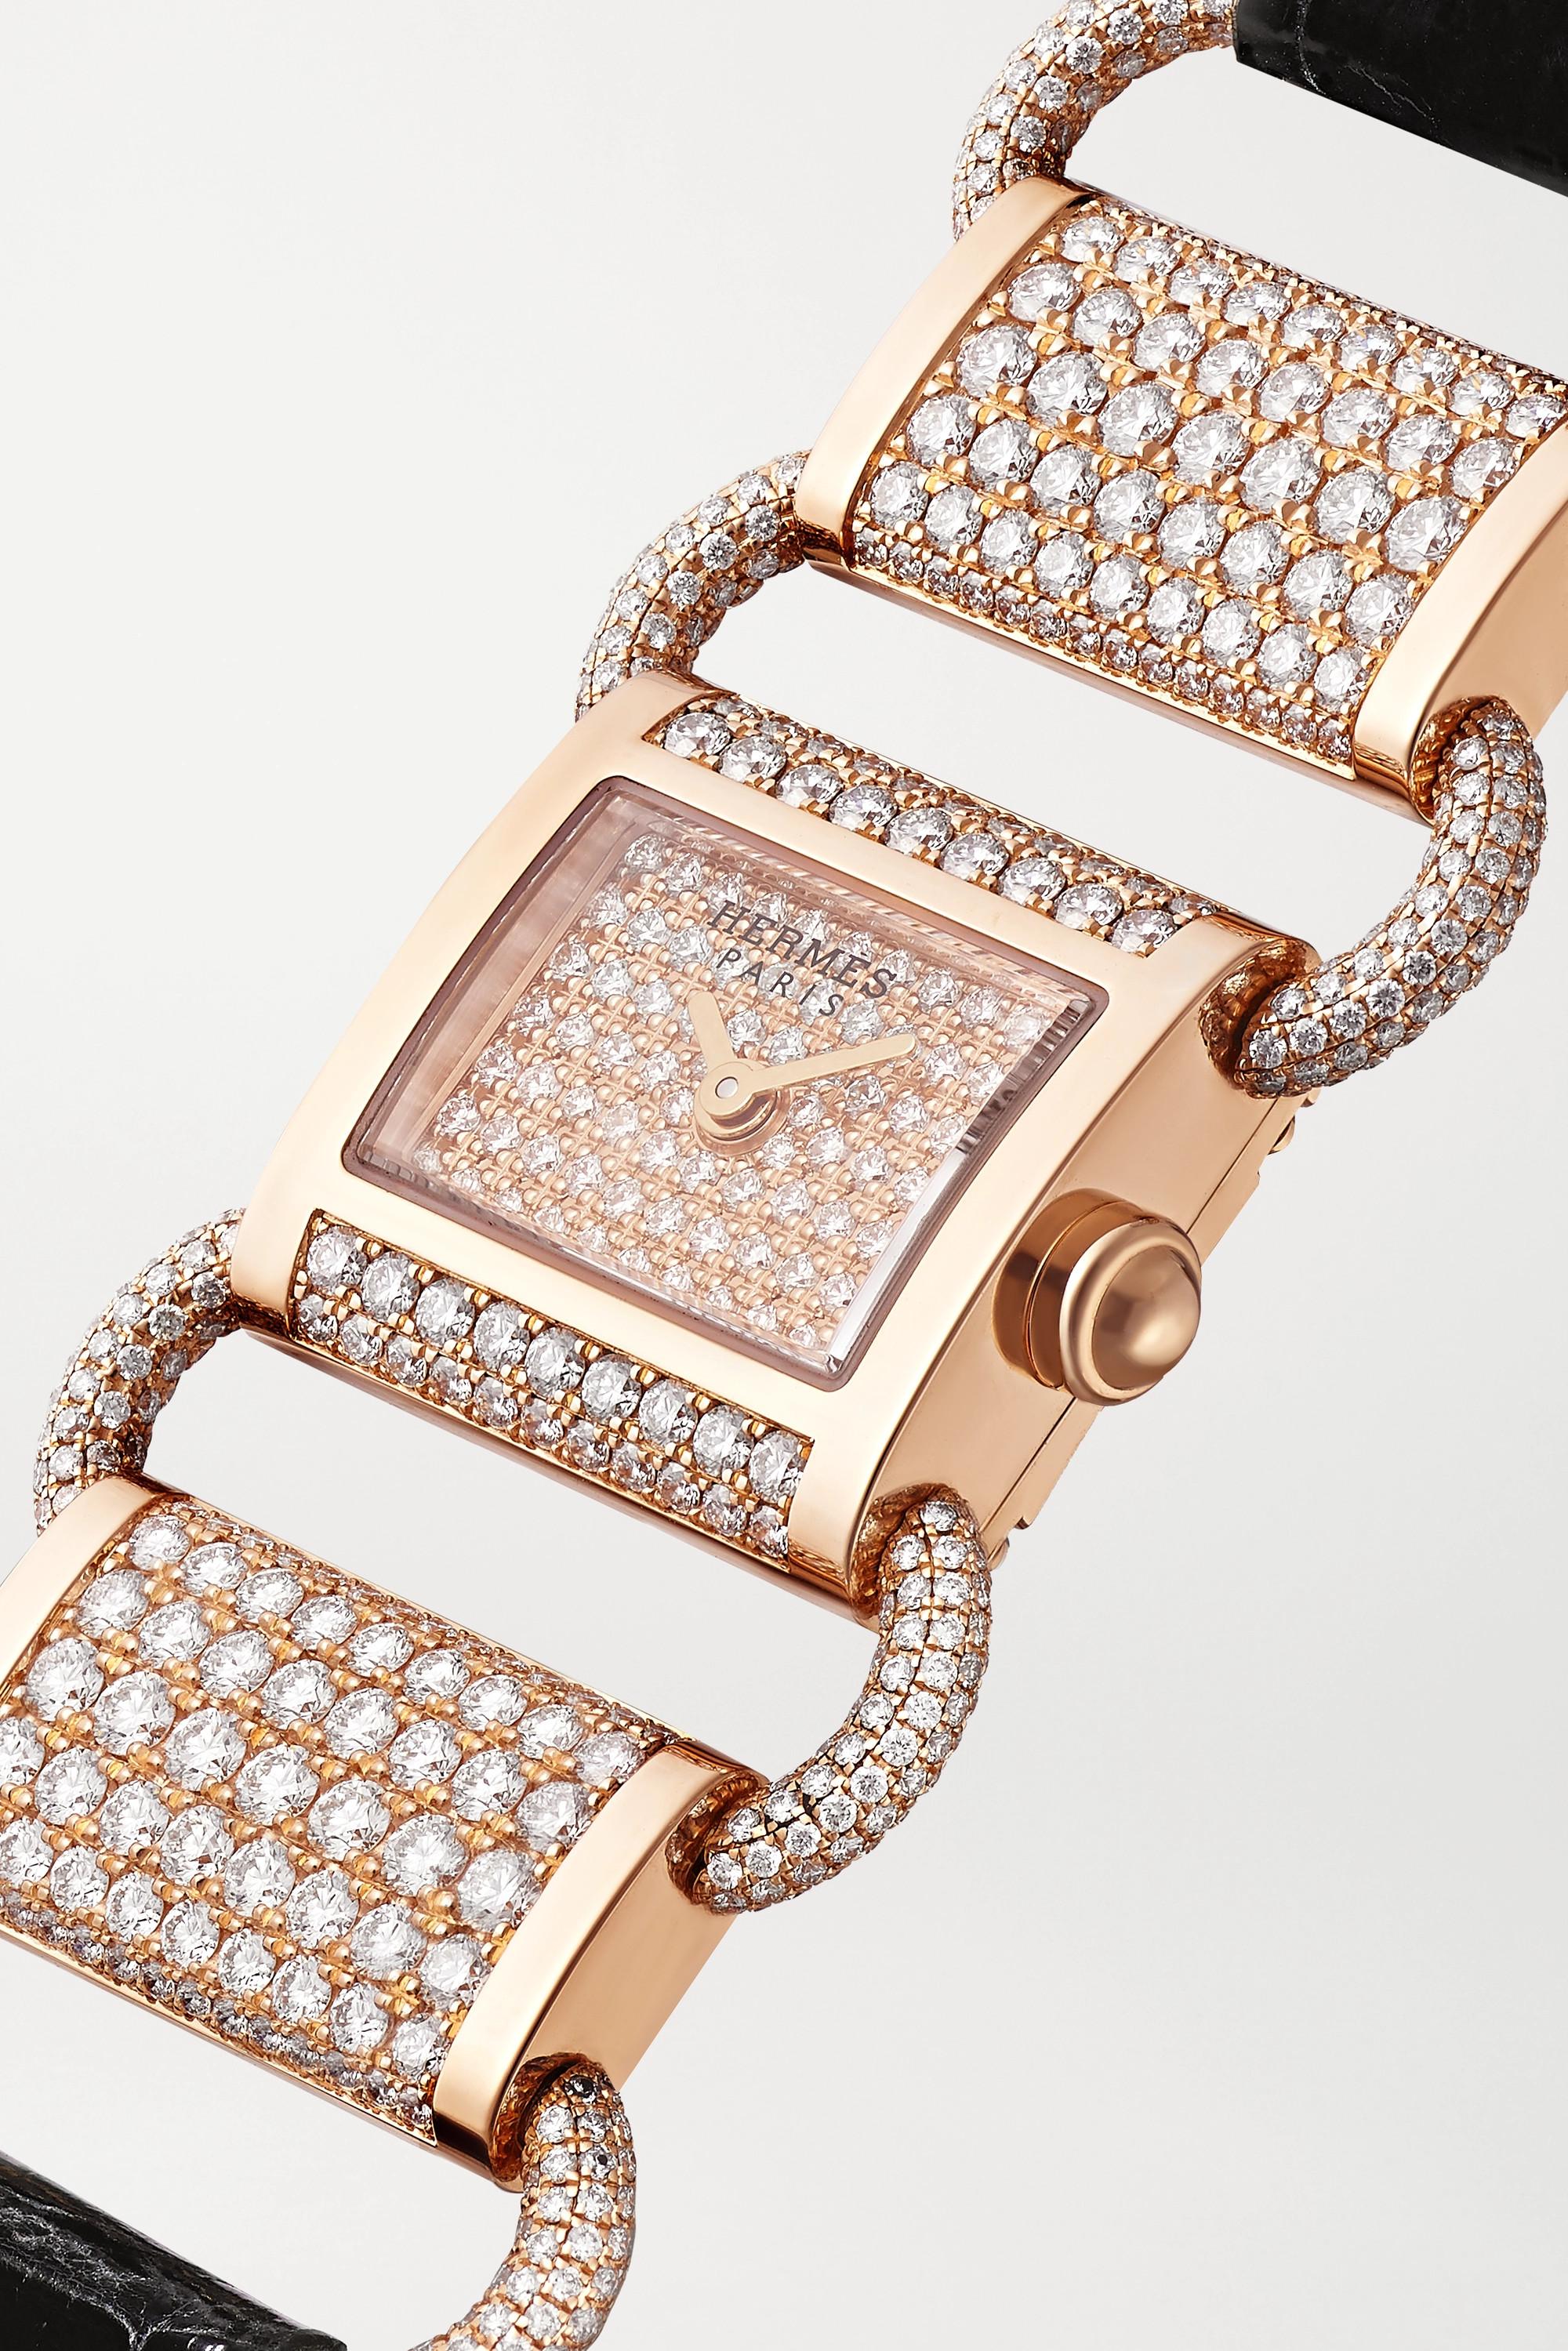 Hermès Timepieces Klikti 17mm very small 18-karat rose gold, alligator and diamond watch